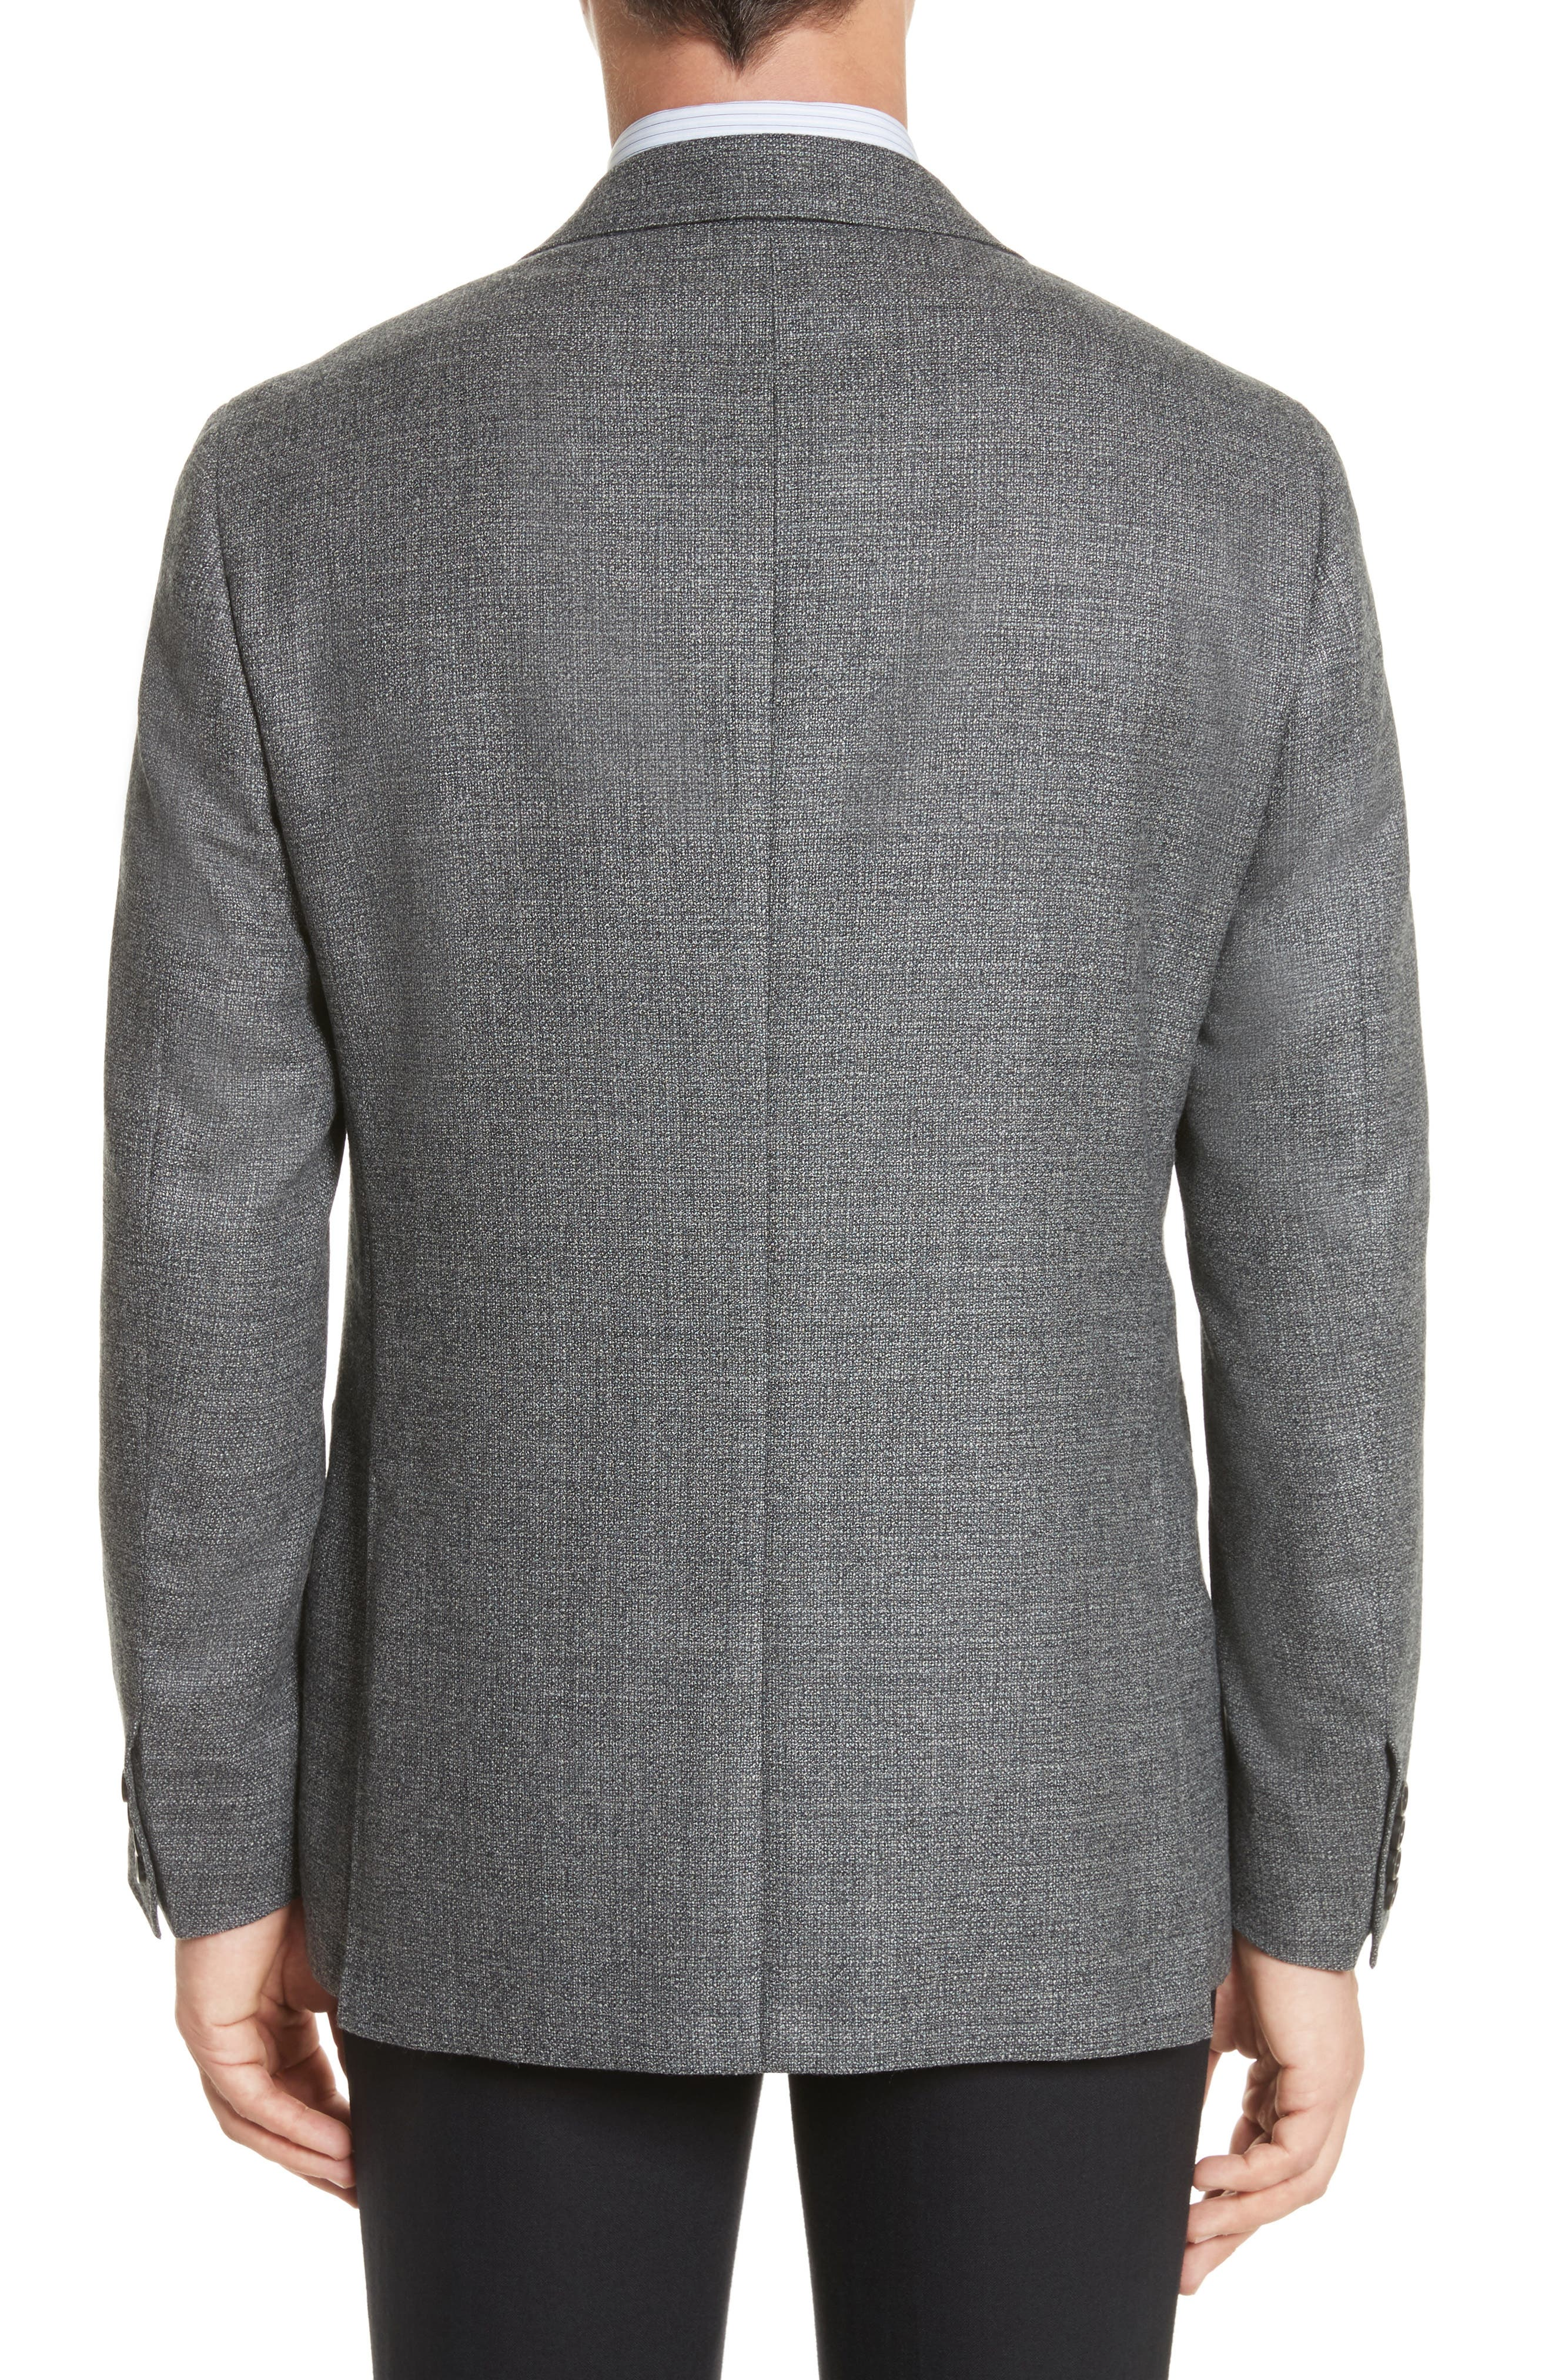 Kei Classic Fit Wool Blazer,                             Alternate thumbnail 2, color,                             030